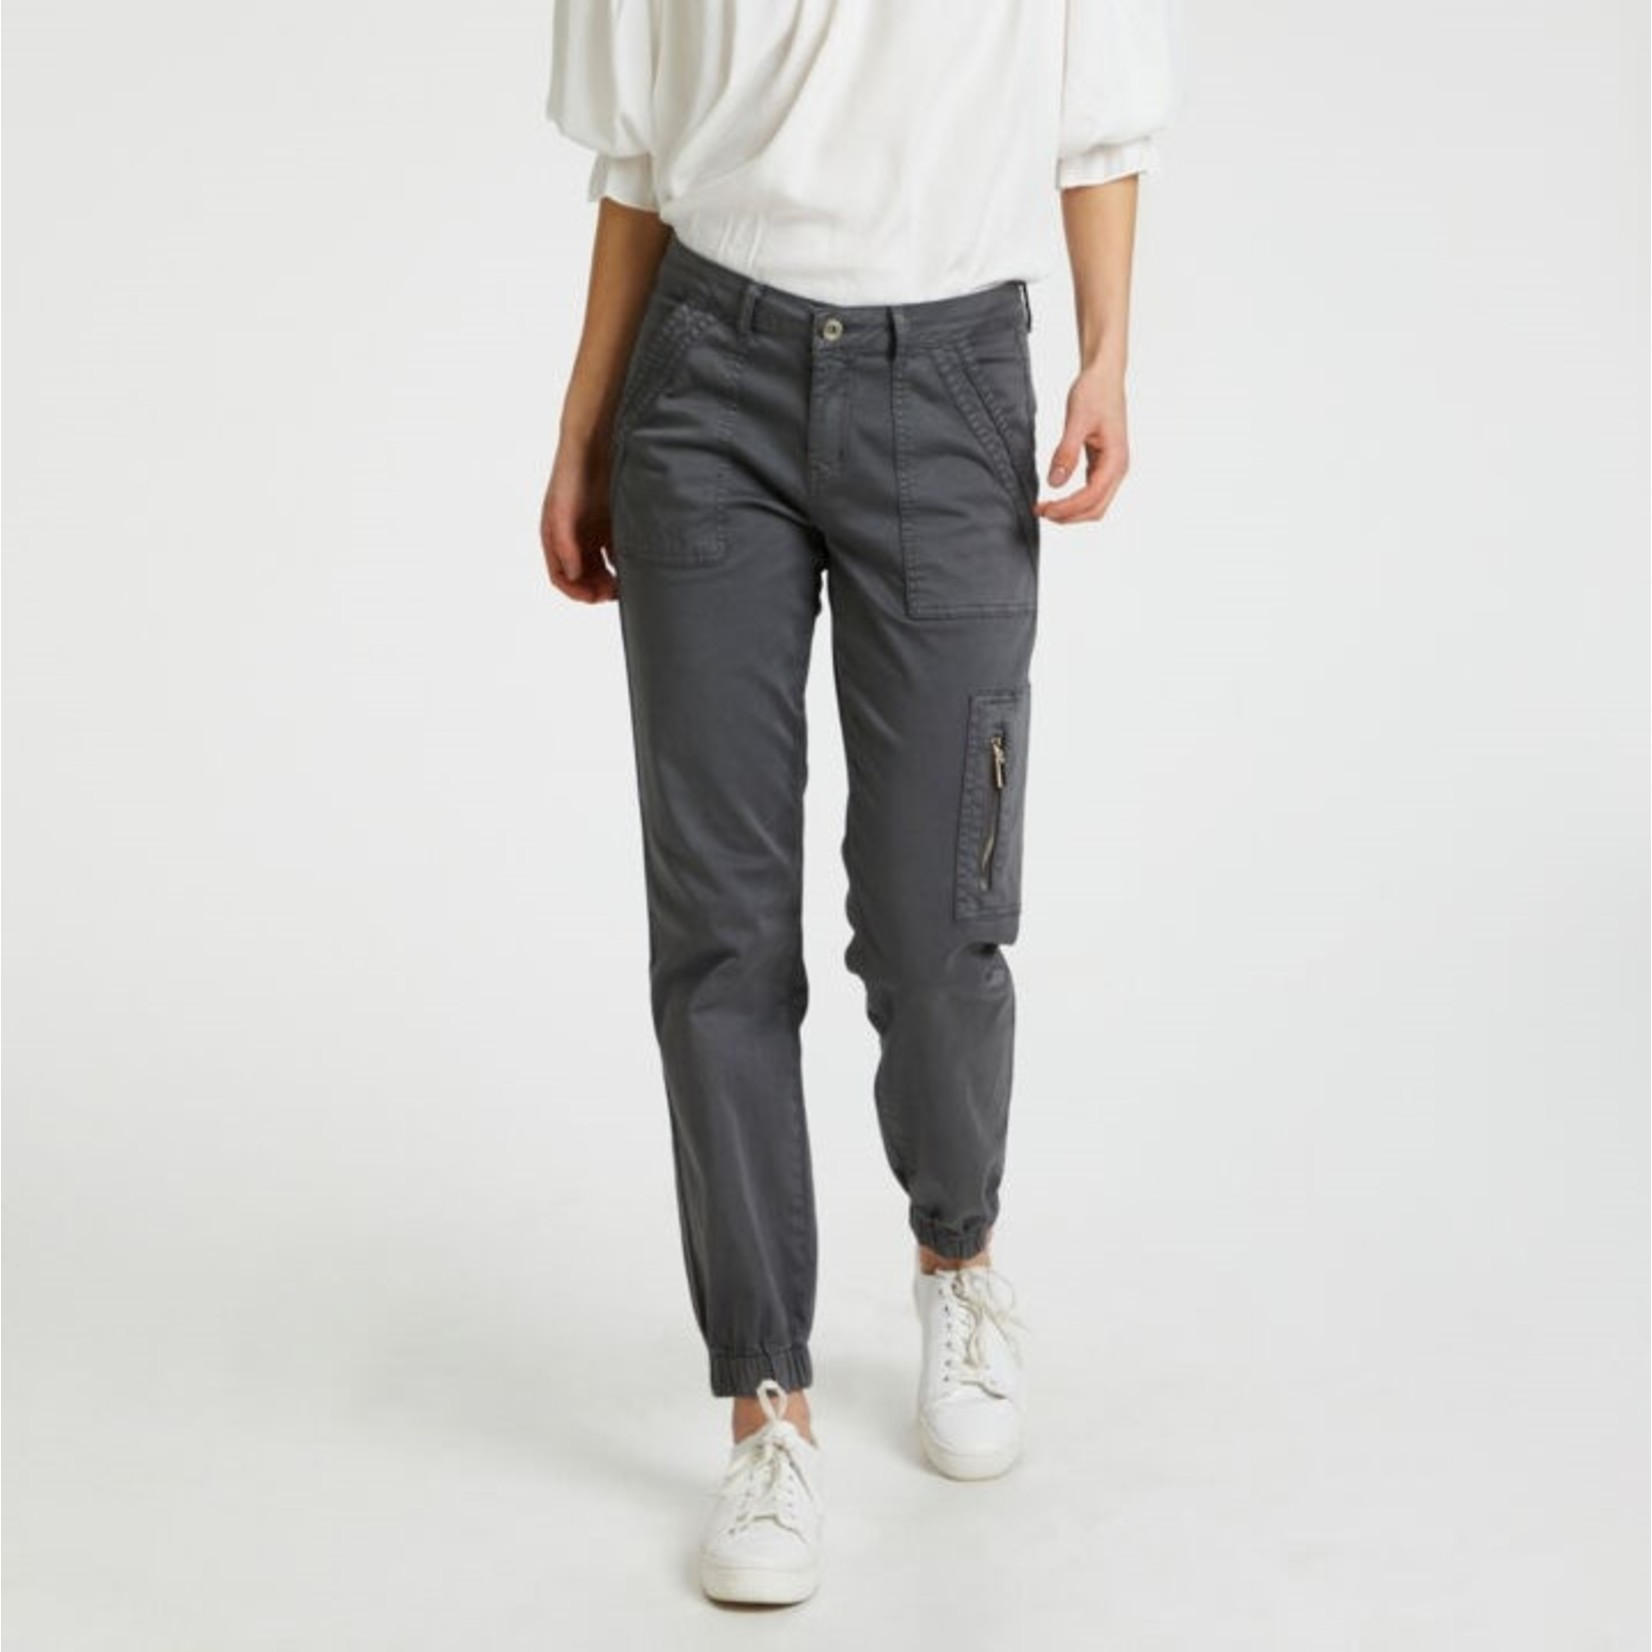 Cream Coco Fit Dafnie Jeans